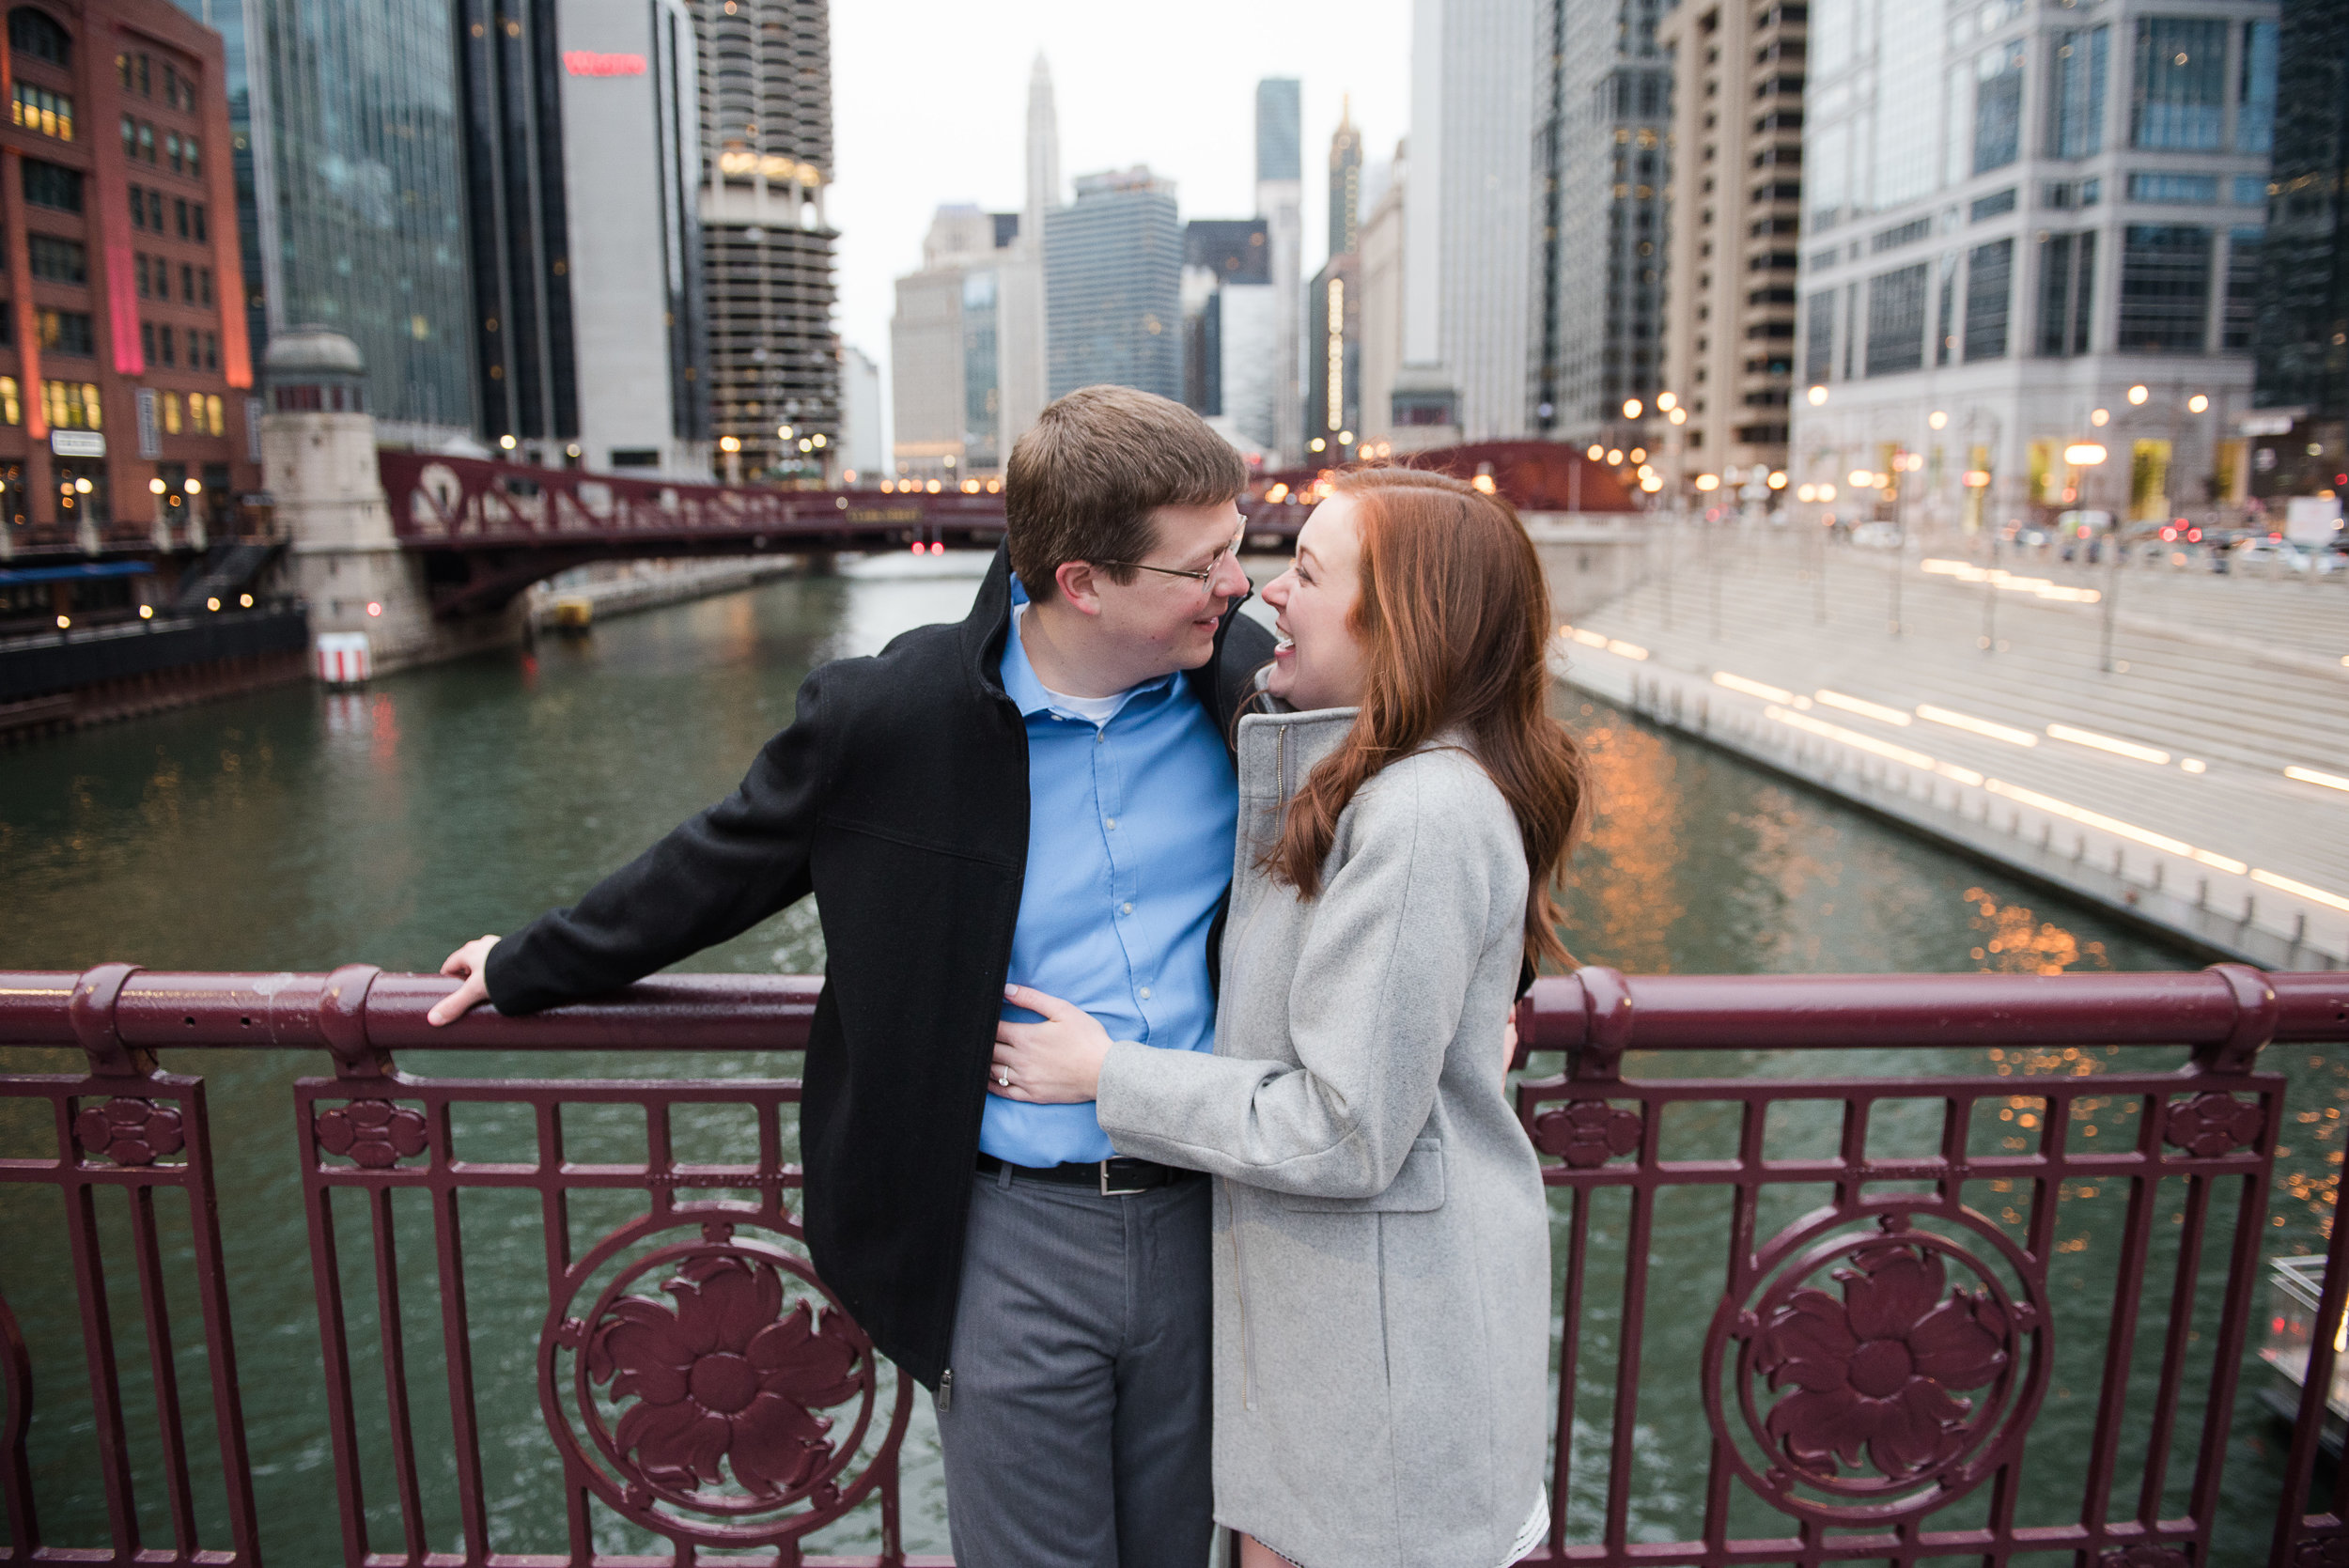 chicago-engagement-photography-metts-photo-13.jpg